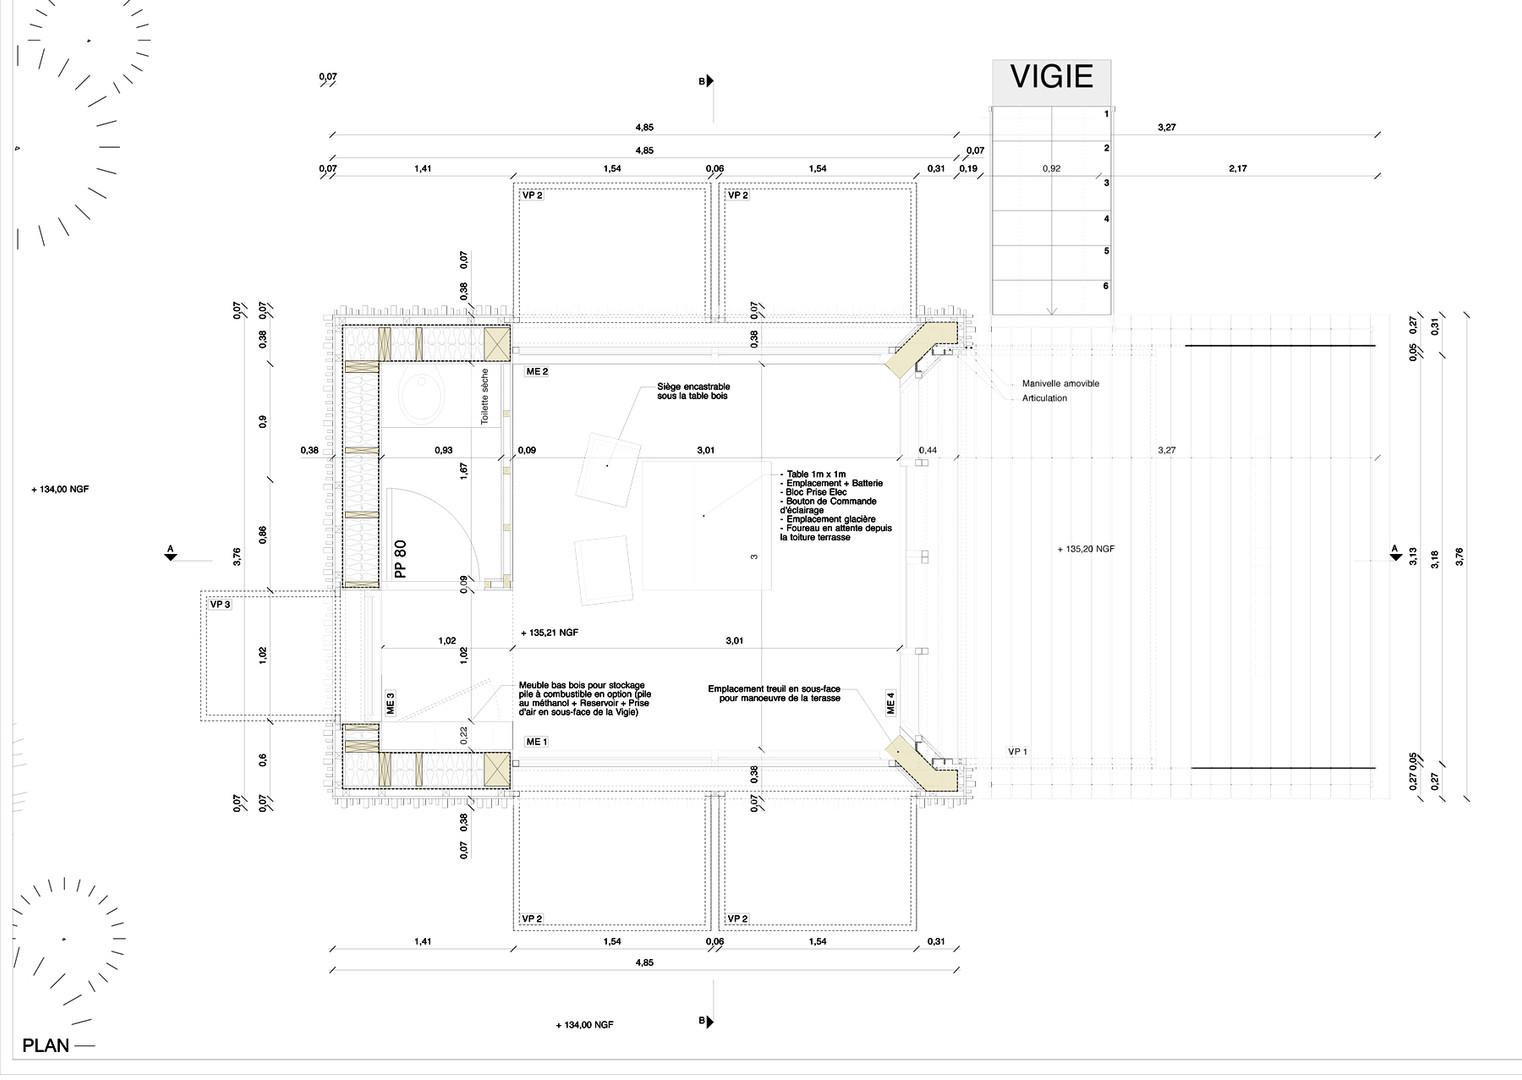 Frutoso-architecte-Vigie-Martigues-plan.